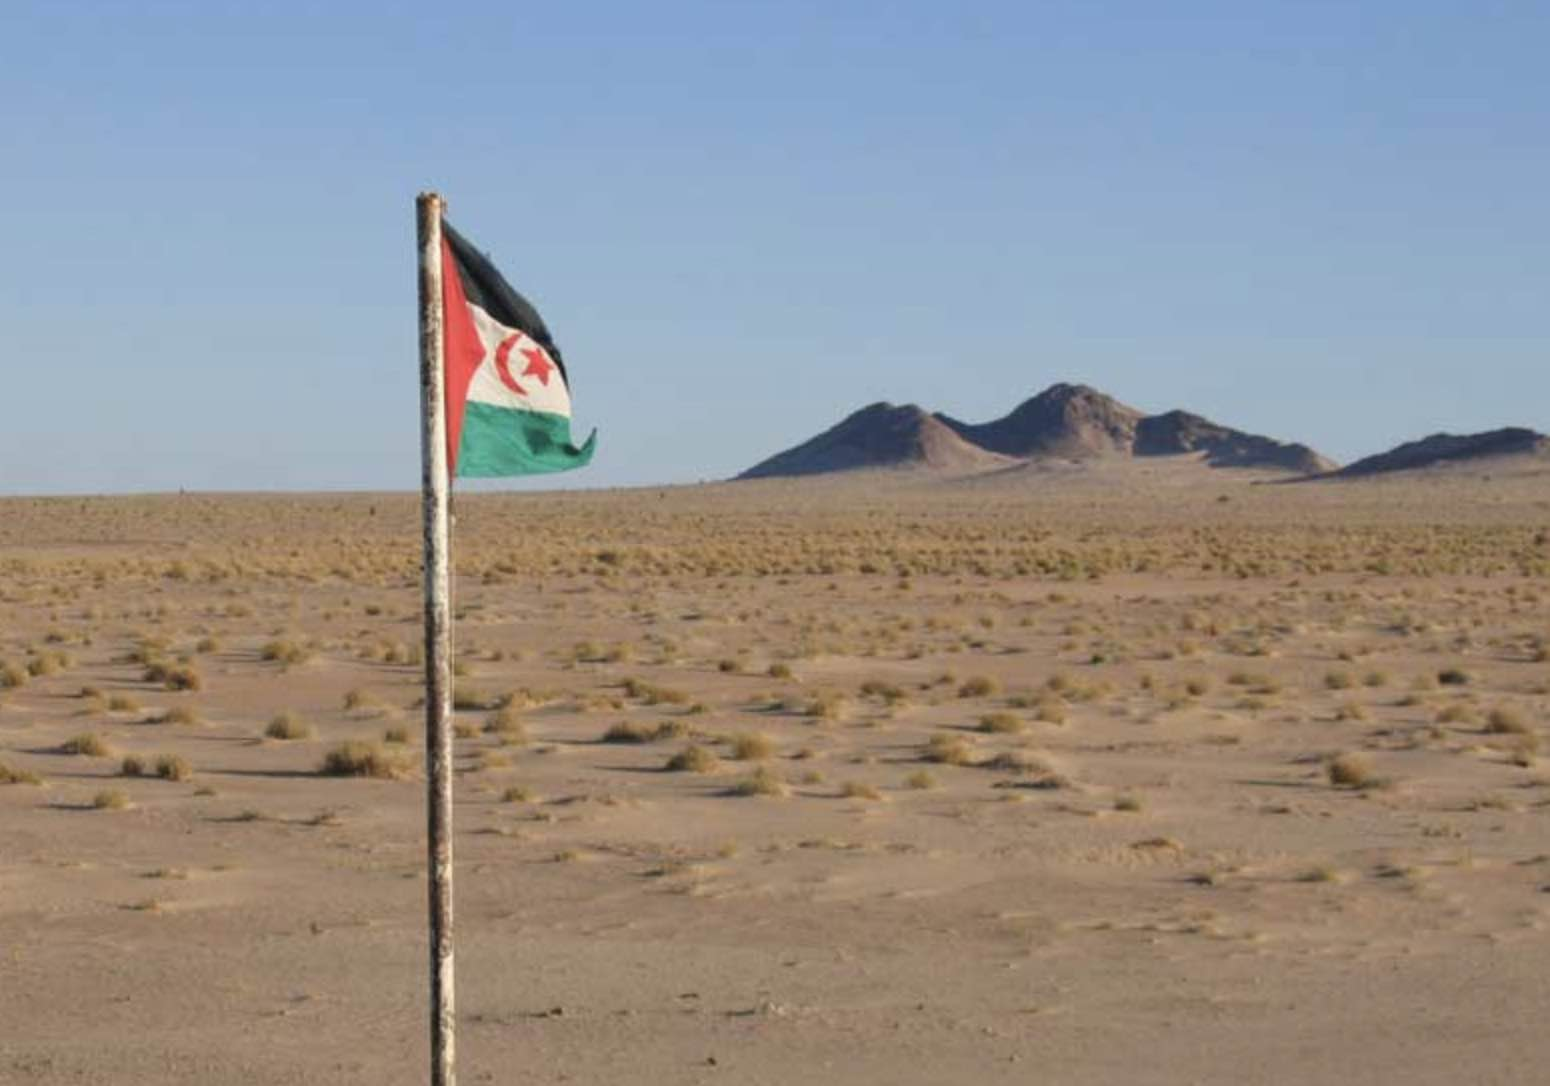 Marruecos, Sahara Occidental, Israel, Oriente Medio